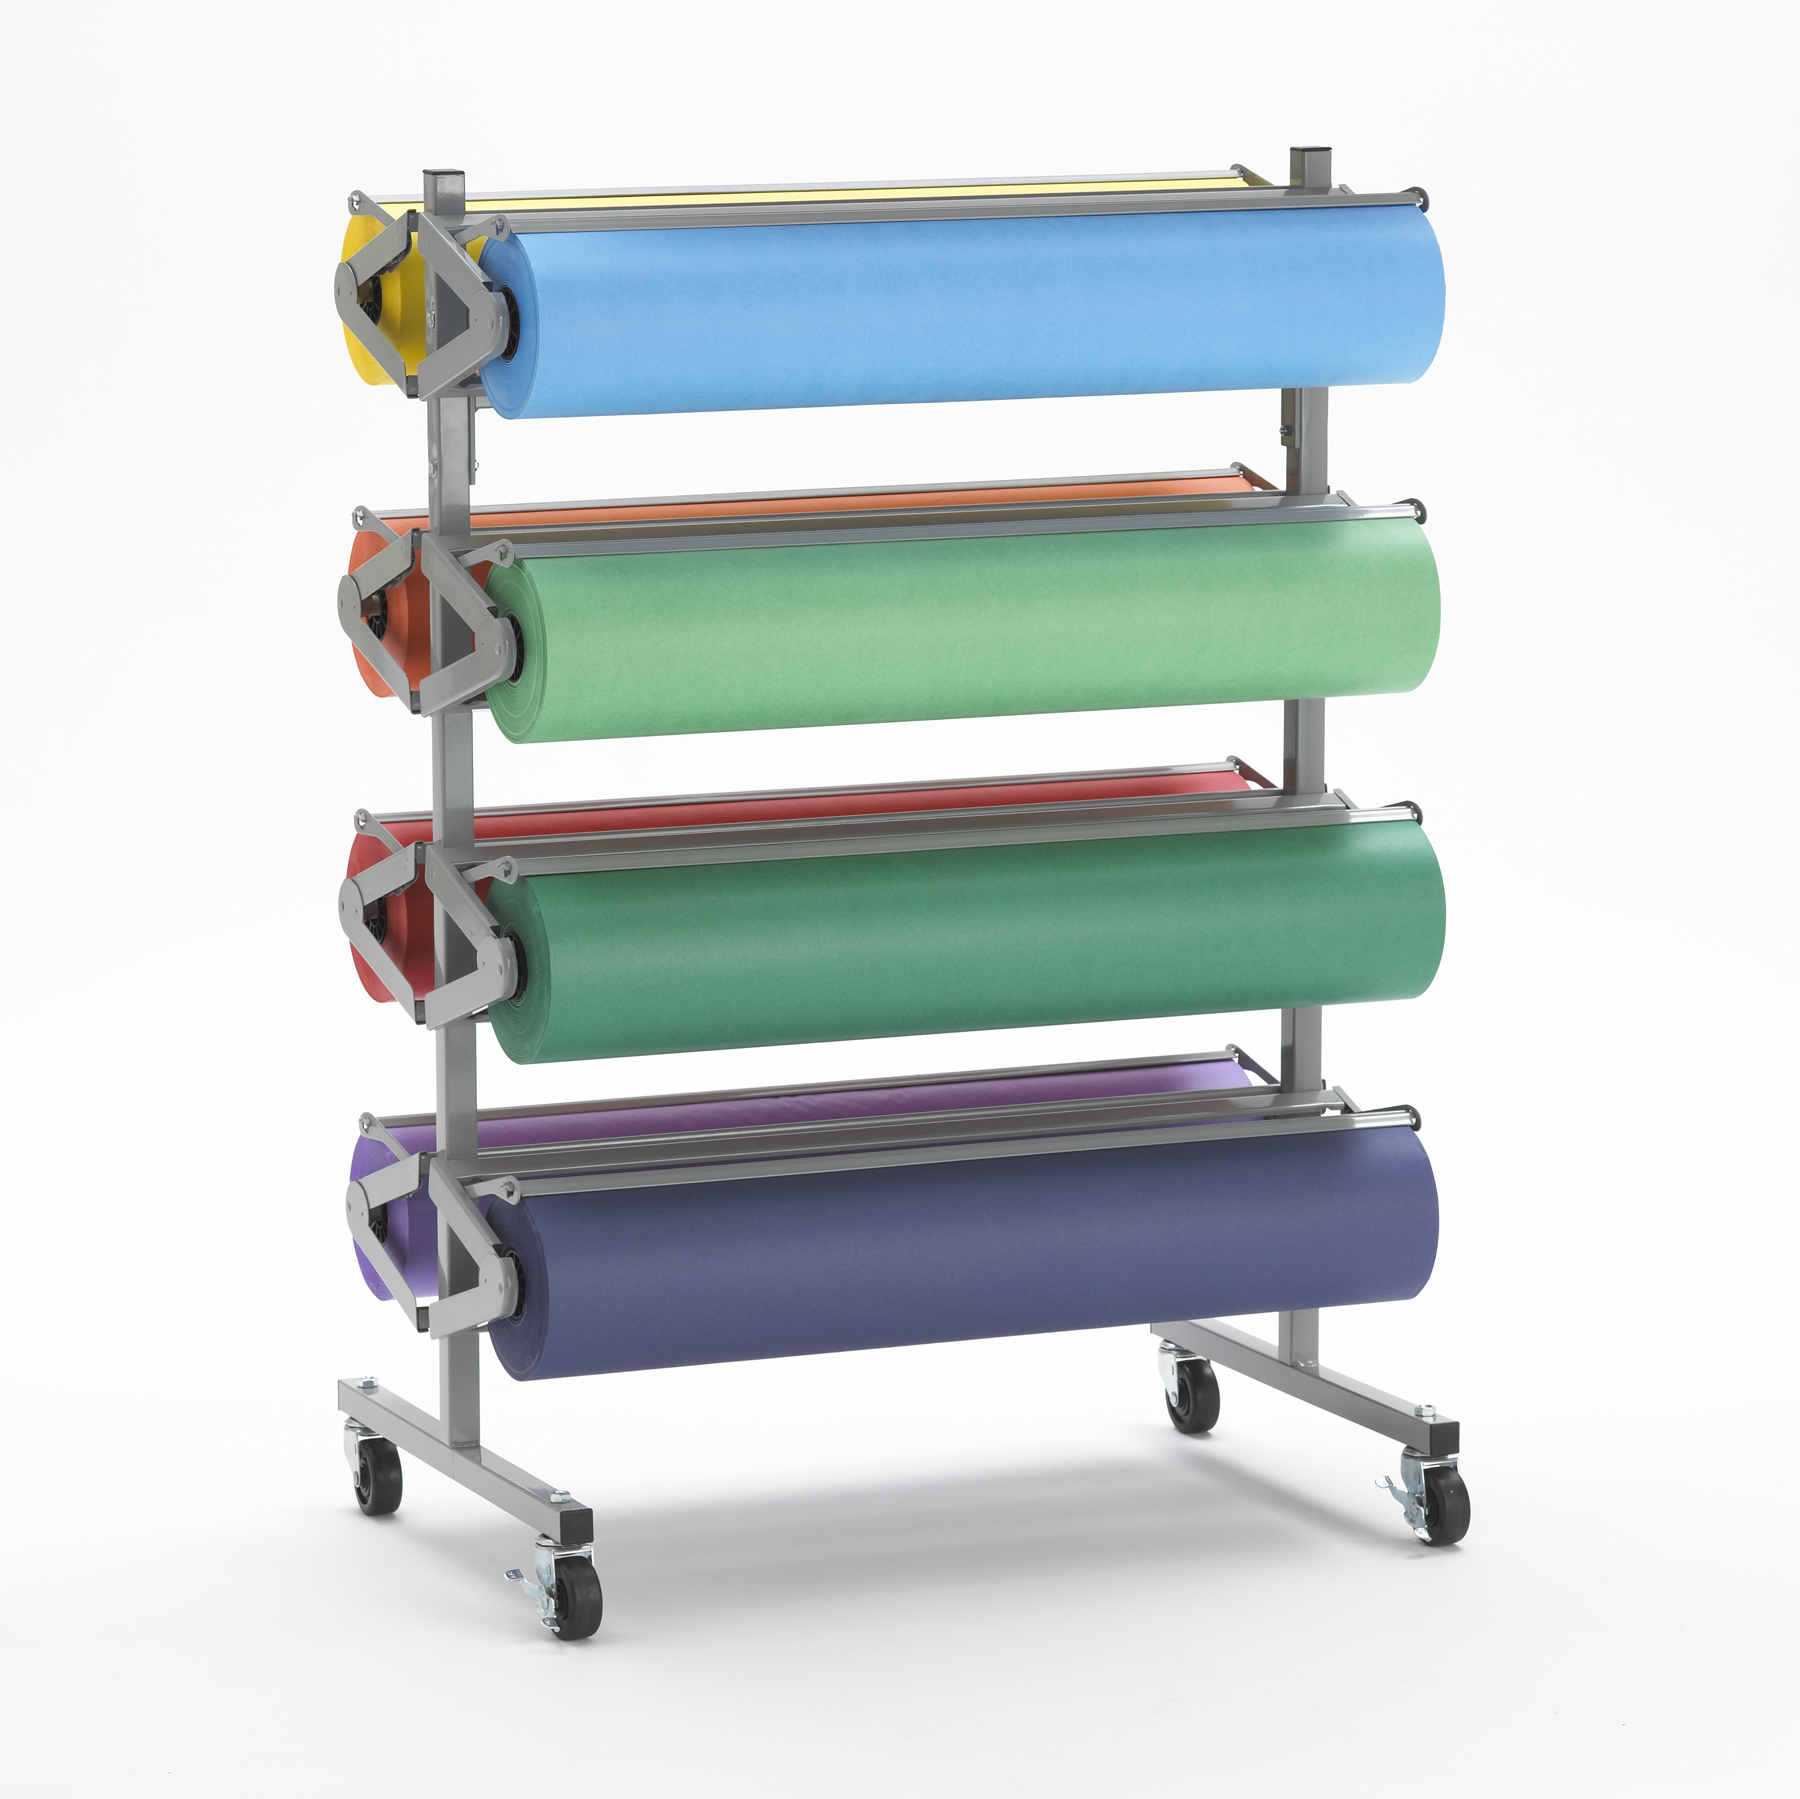 R370 Standard Rola-Rack